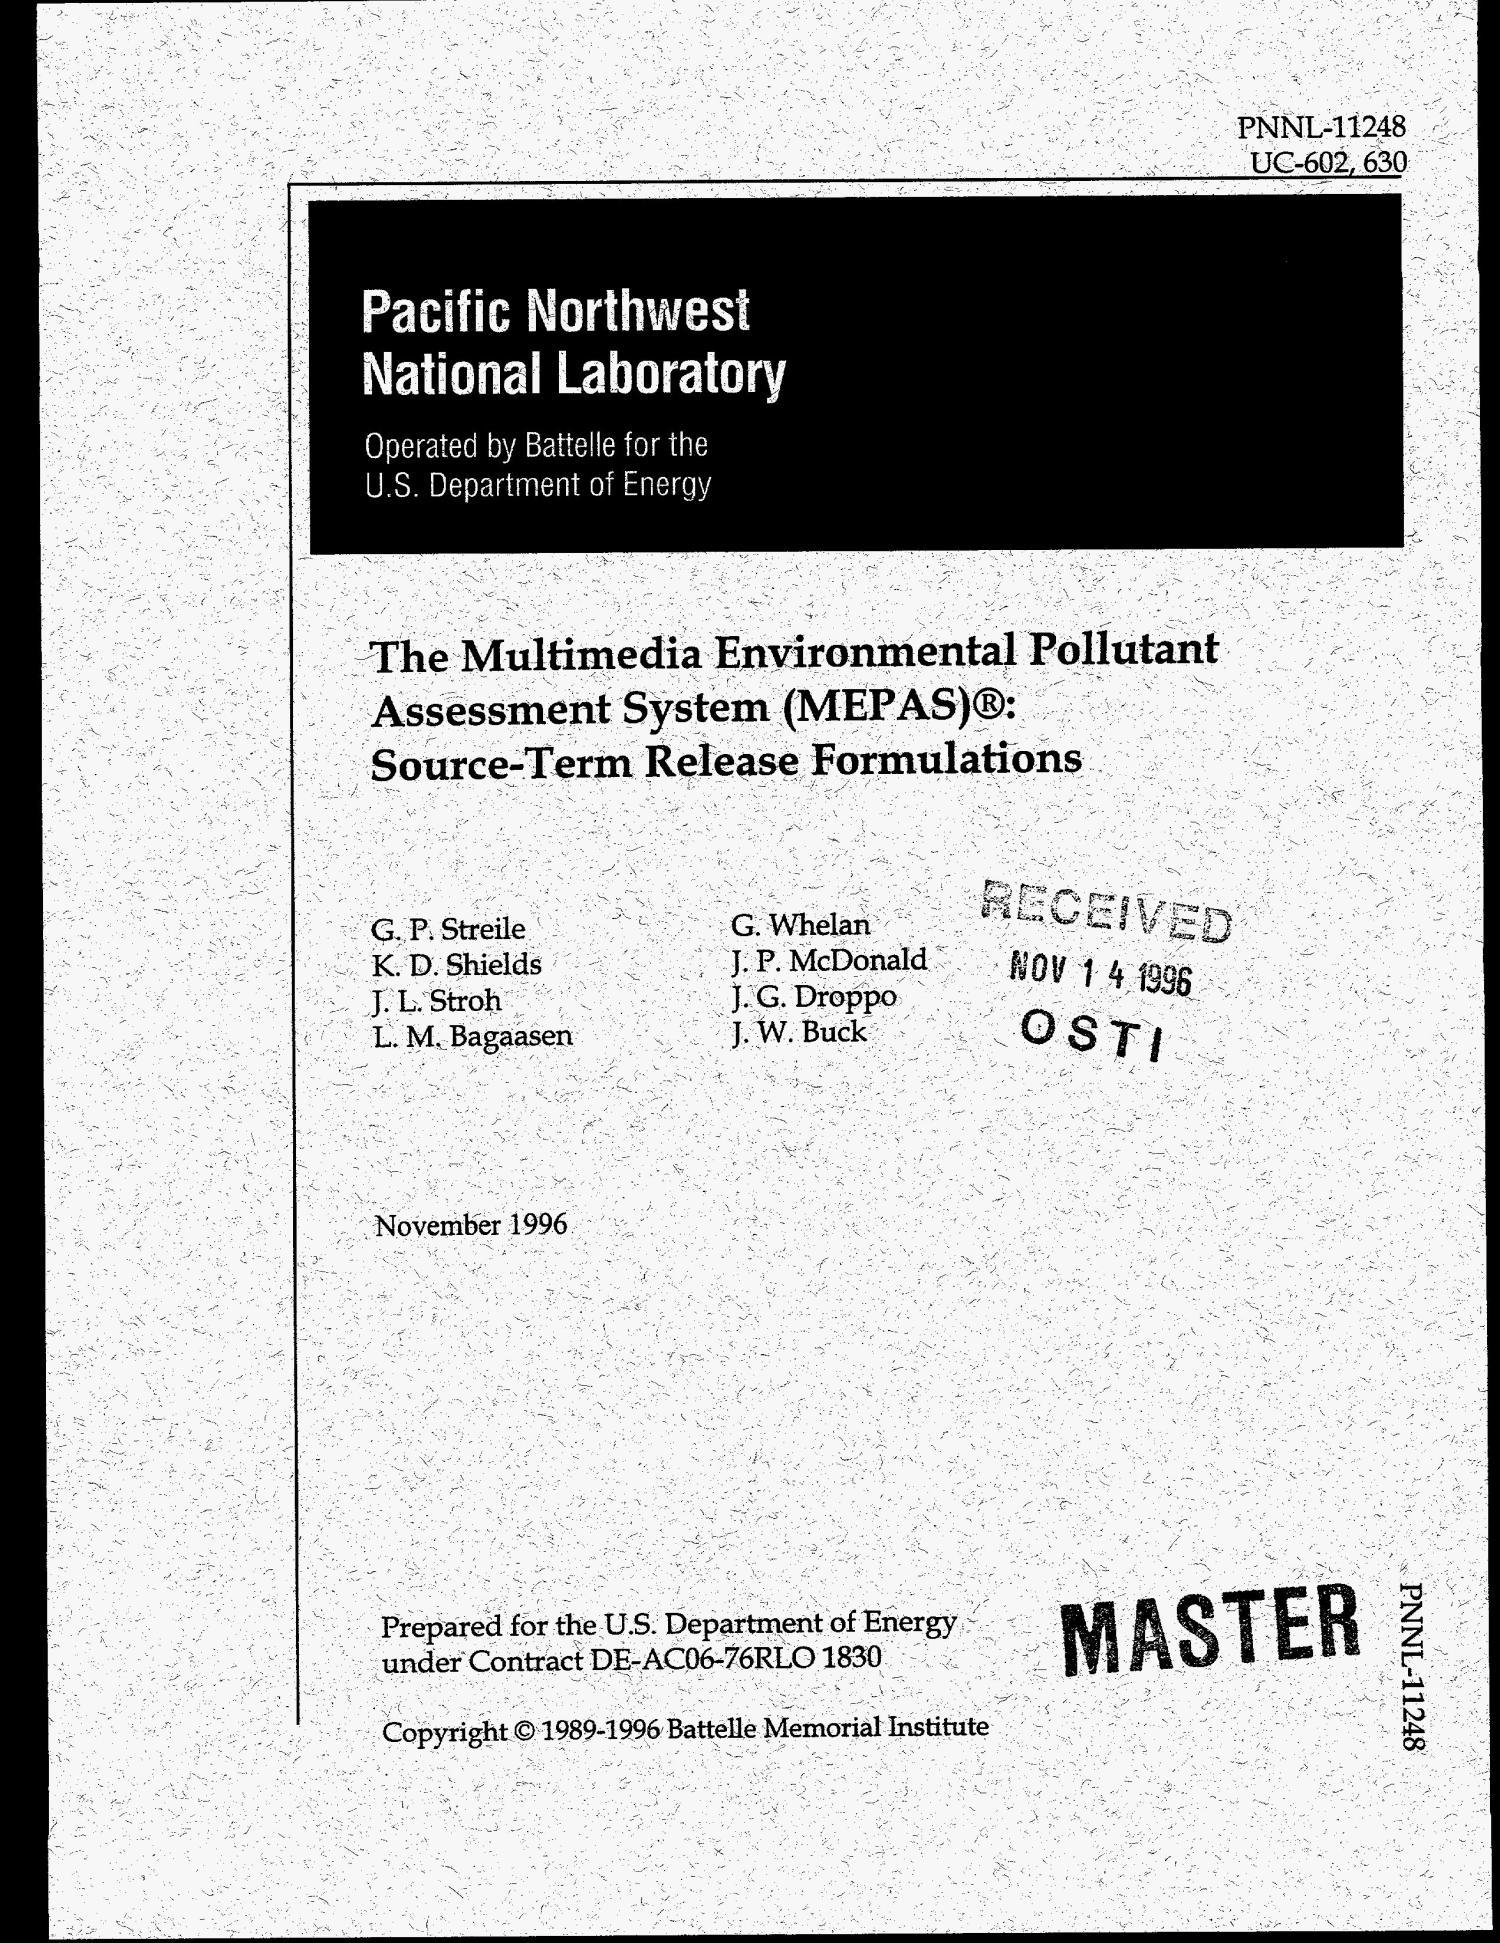 The Multimedia Environmental Pollutant Assessment System